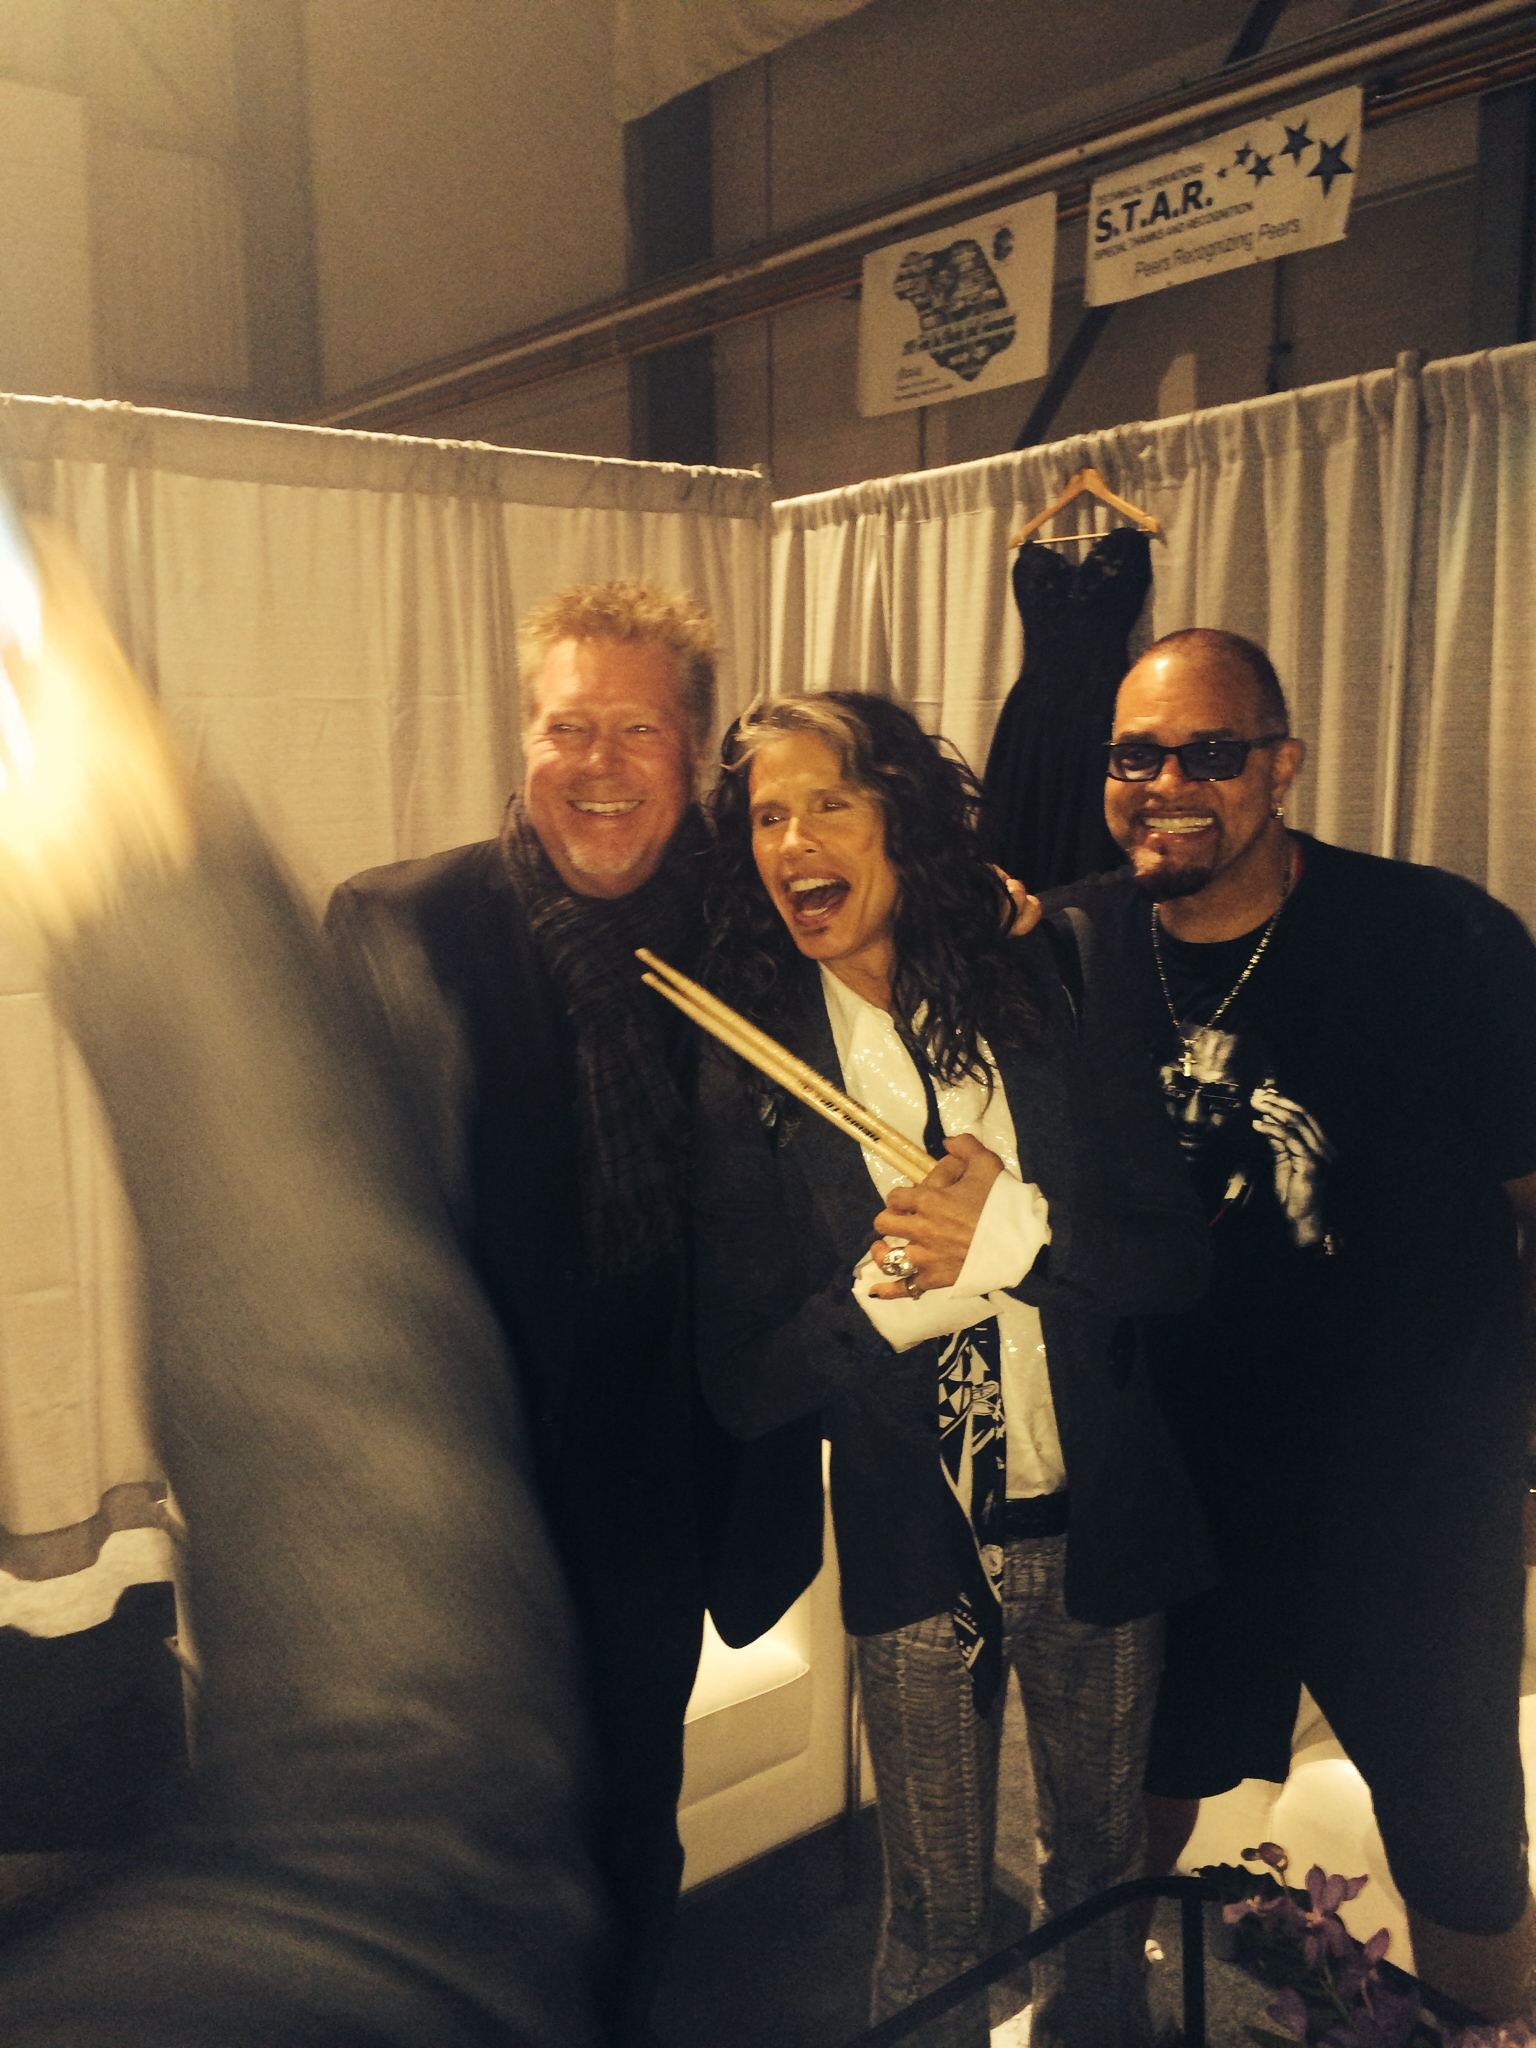 JR, Steven Tyler, & Sinbad